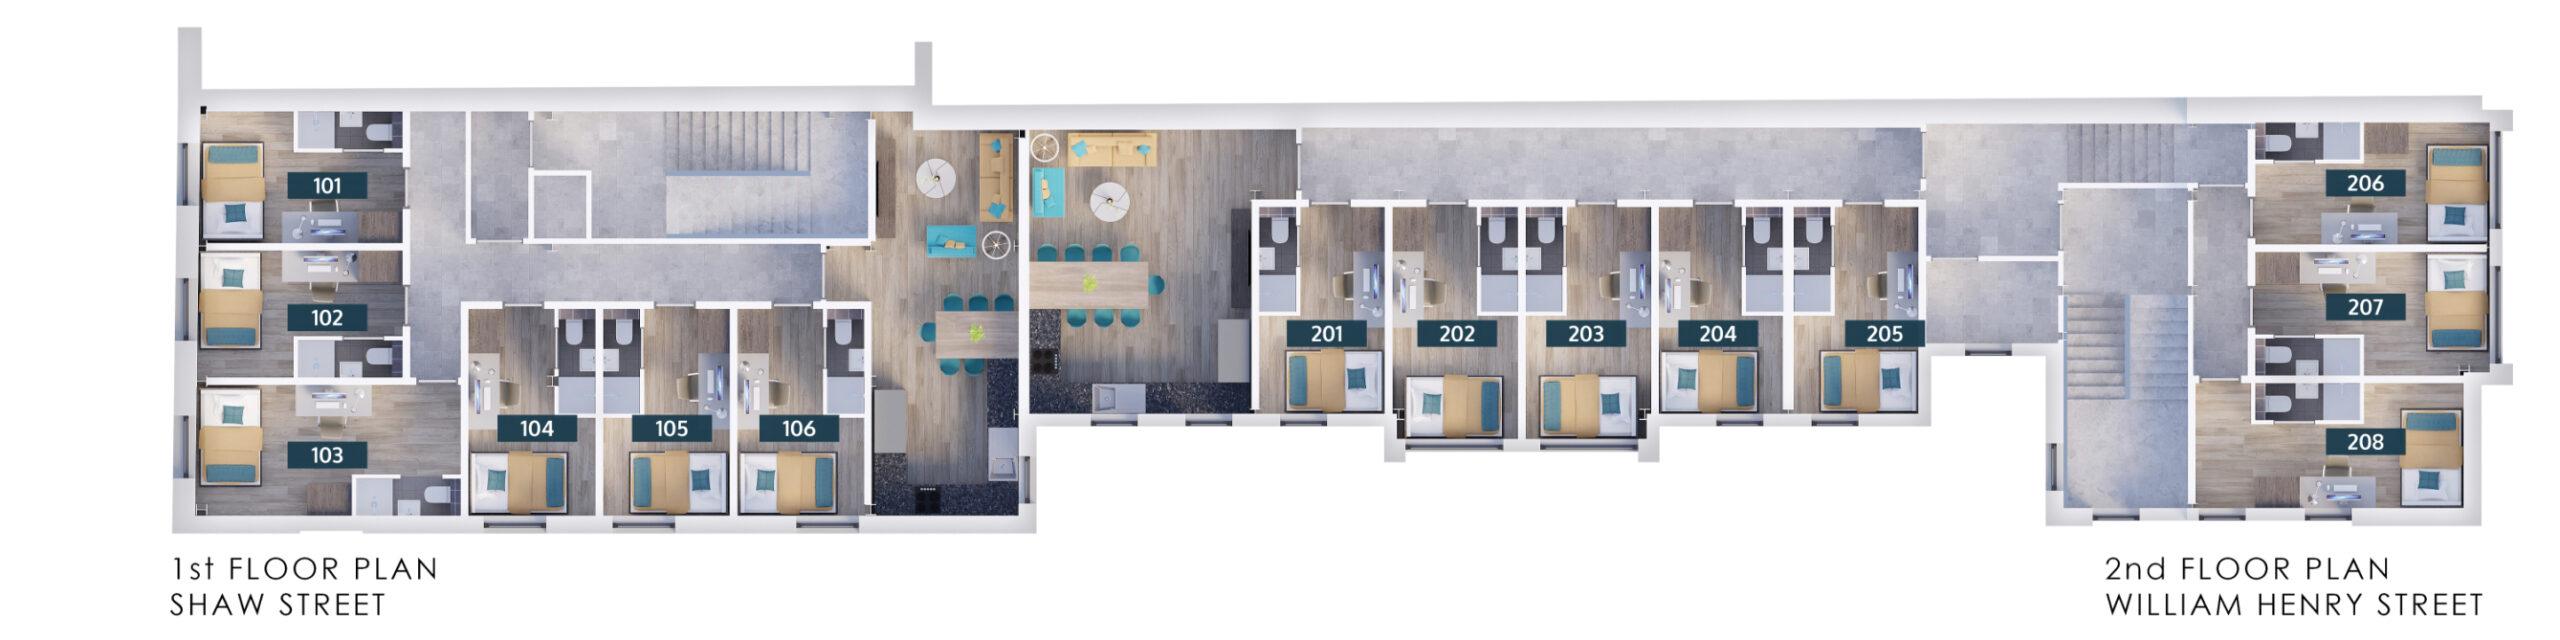 Shaw Street - First Floor Plan